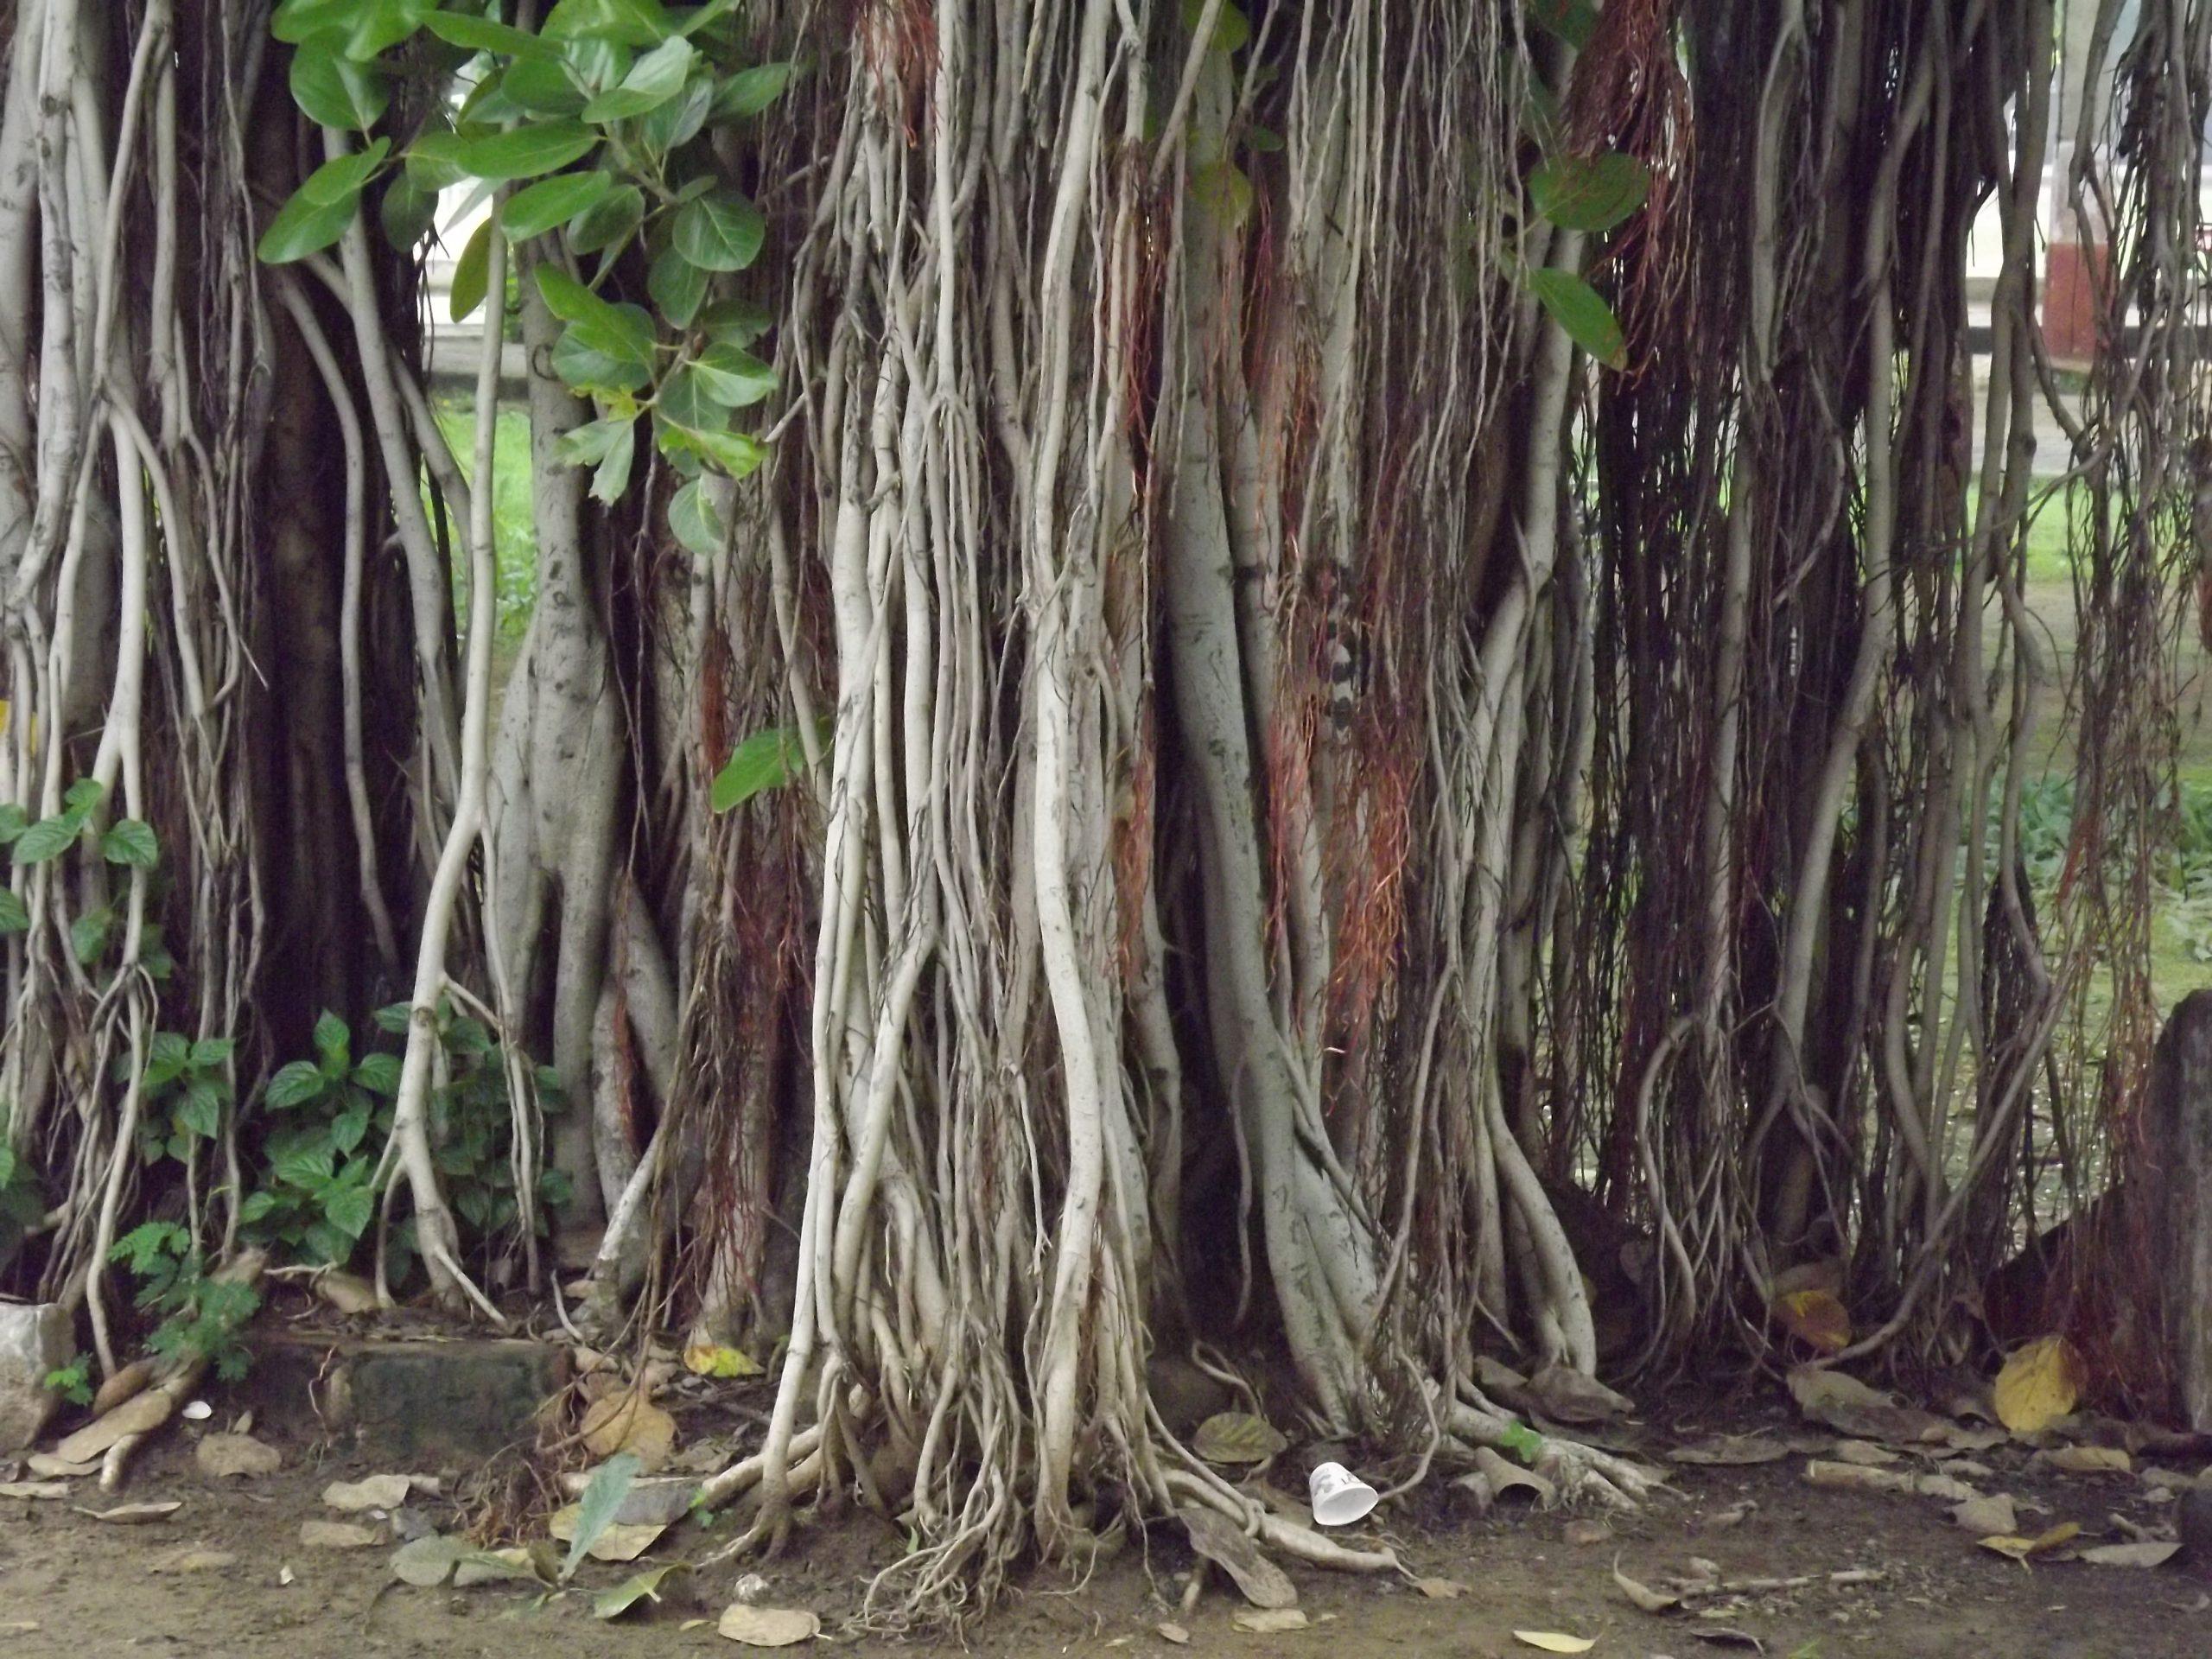 Falling roots of a big tree